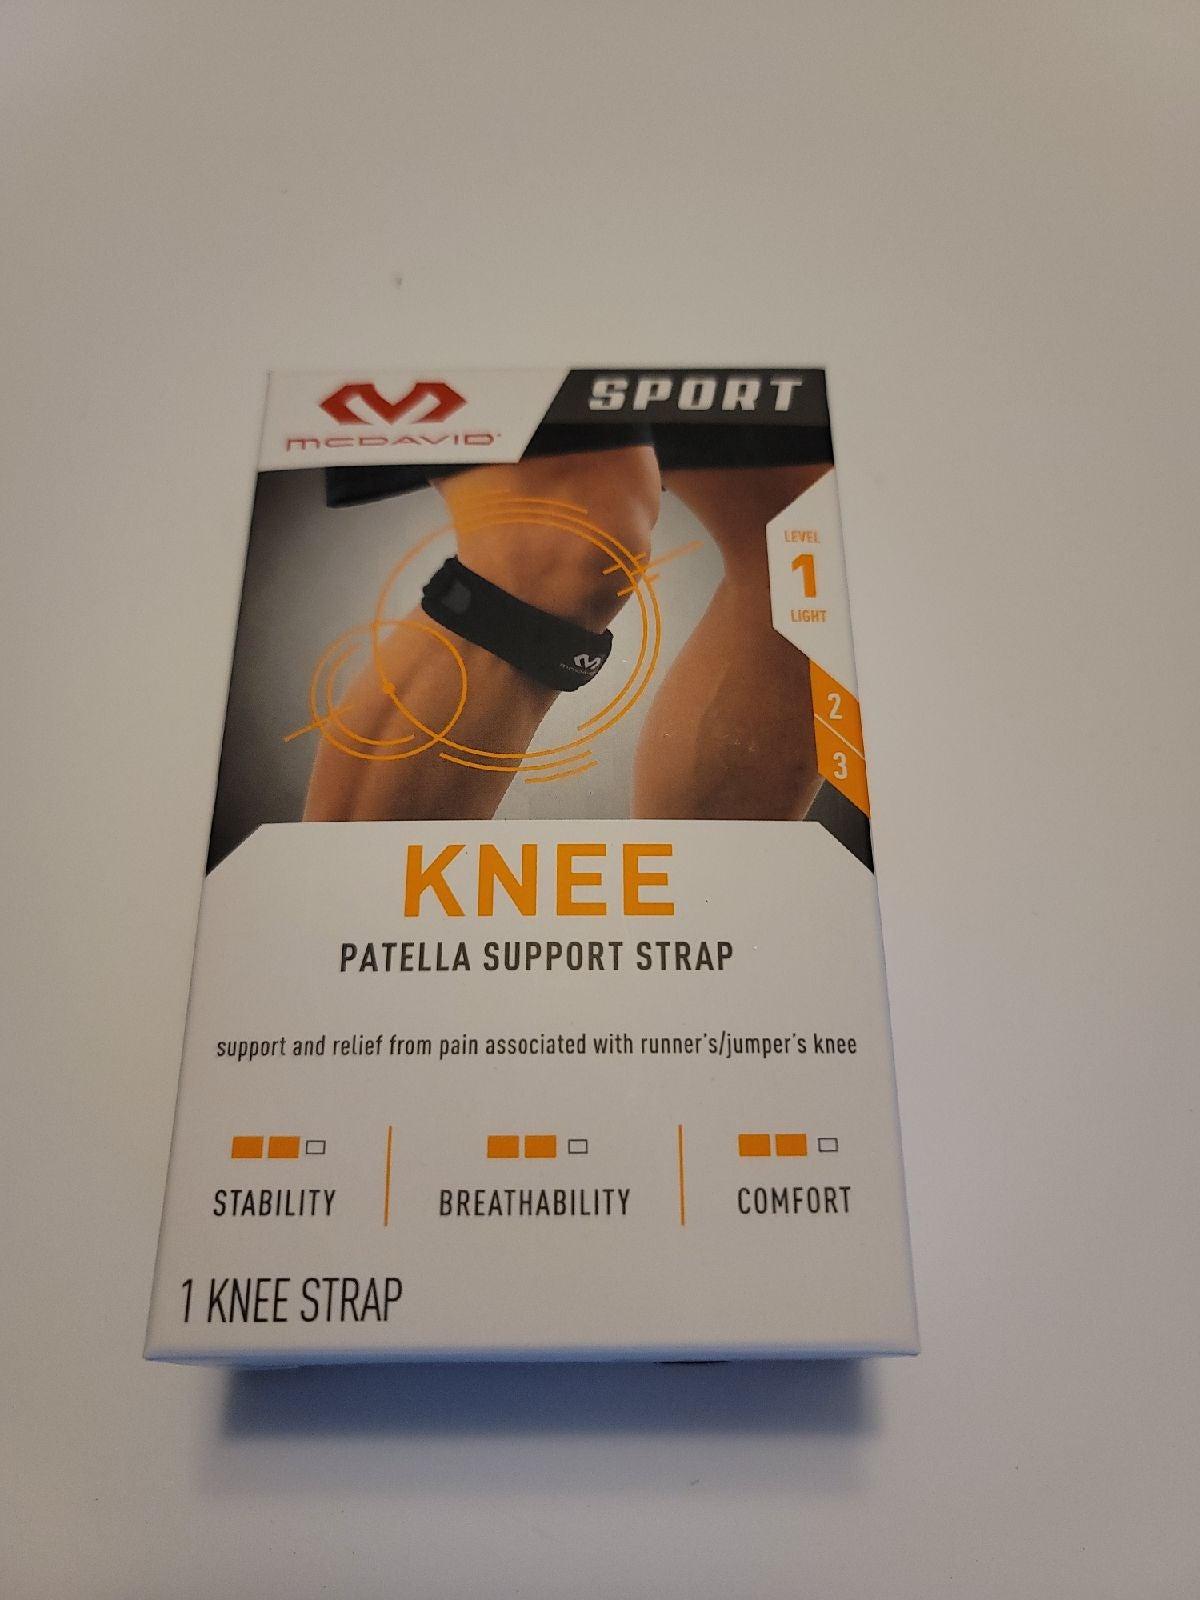 Mcdavid Knee Patella Support Strap